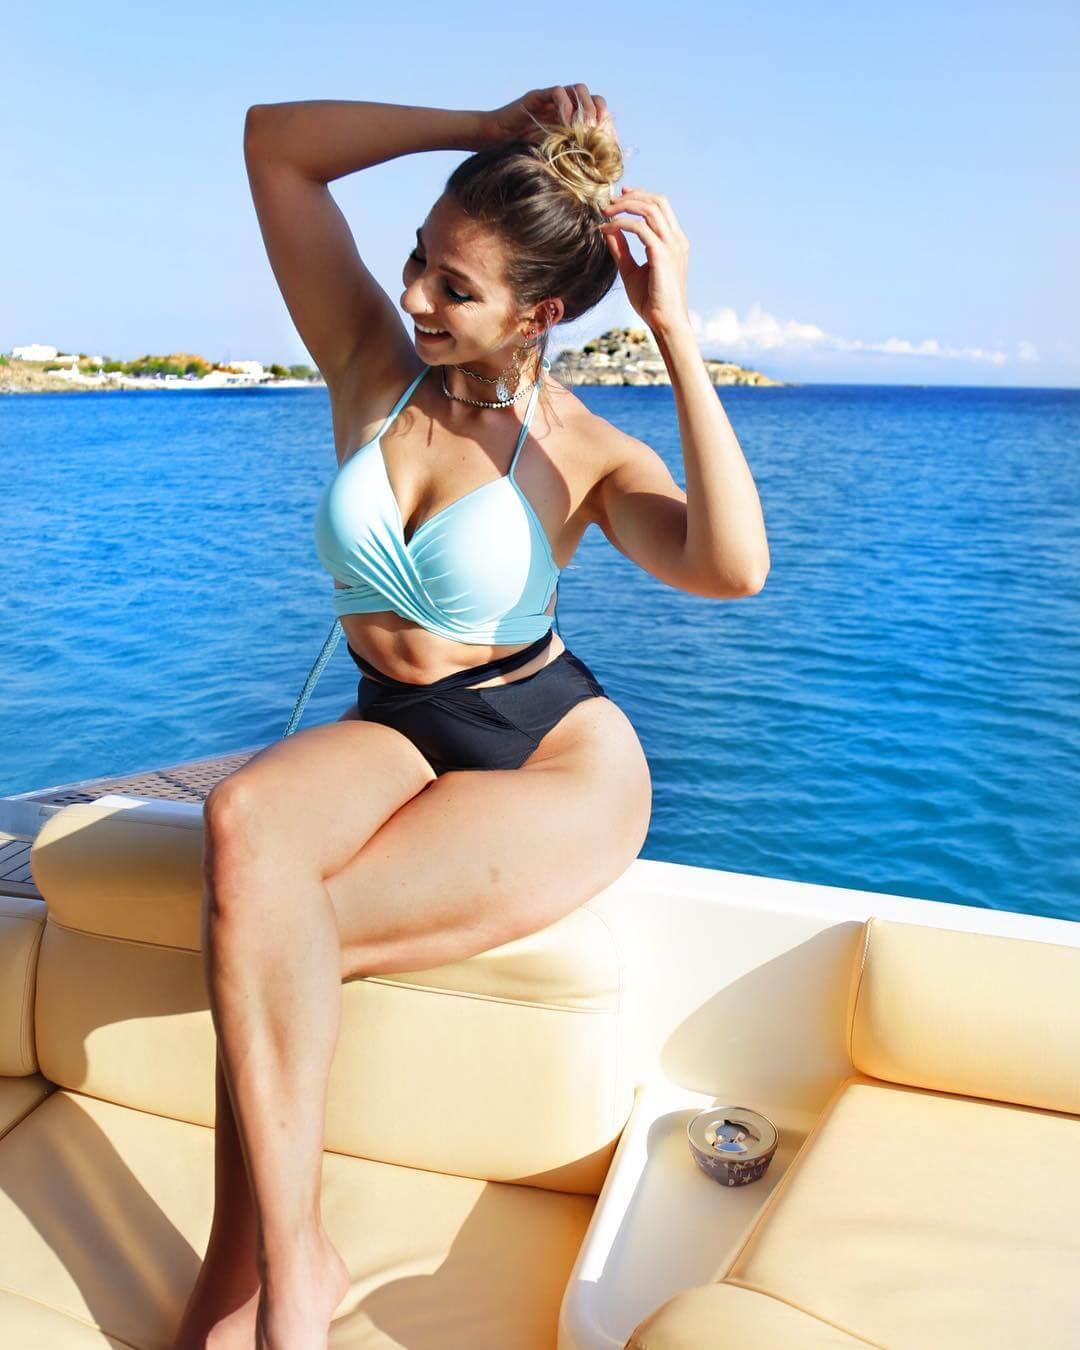 Gabbie Hanna bikini pics (1)